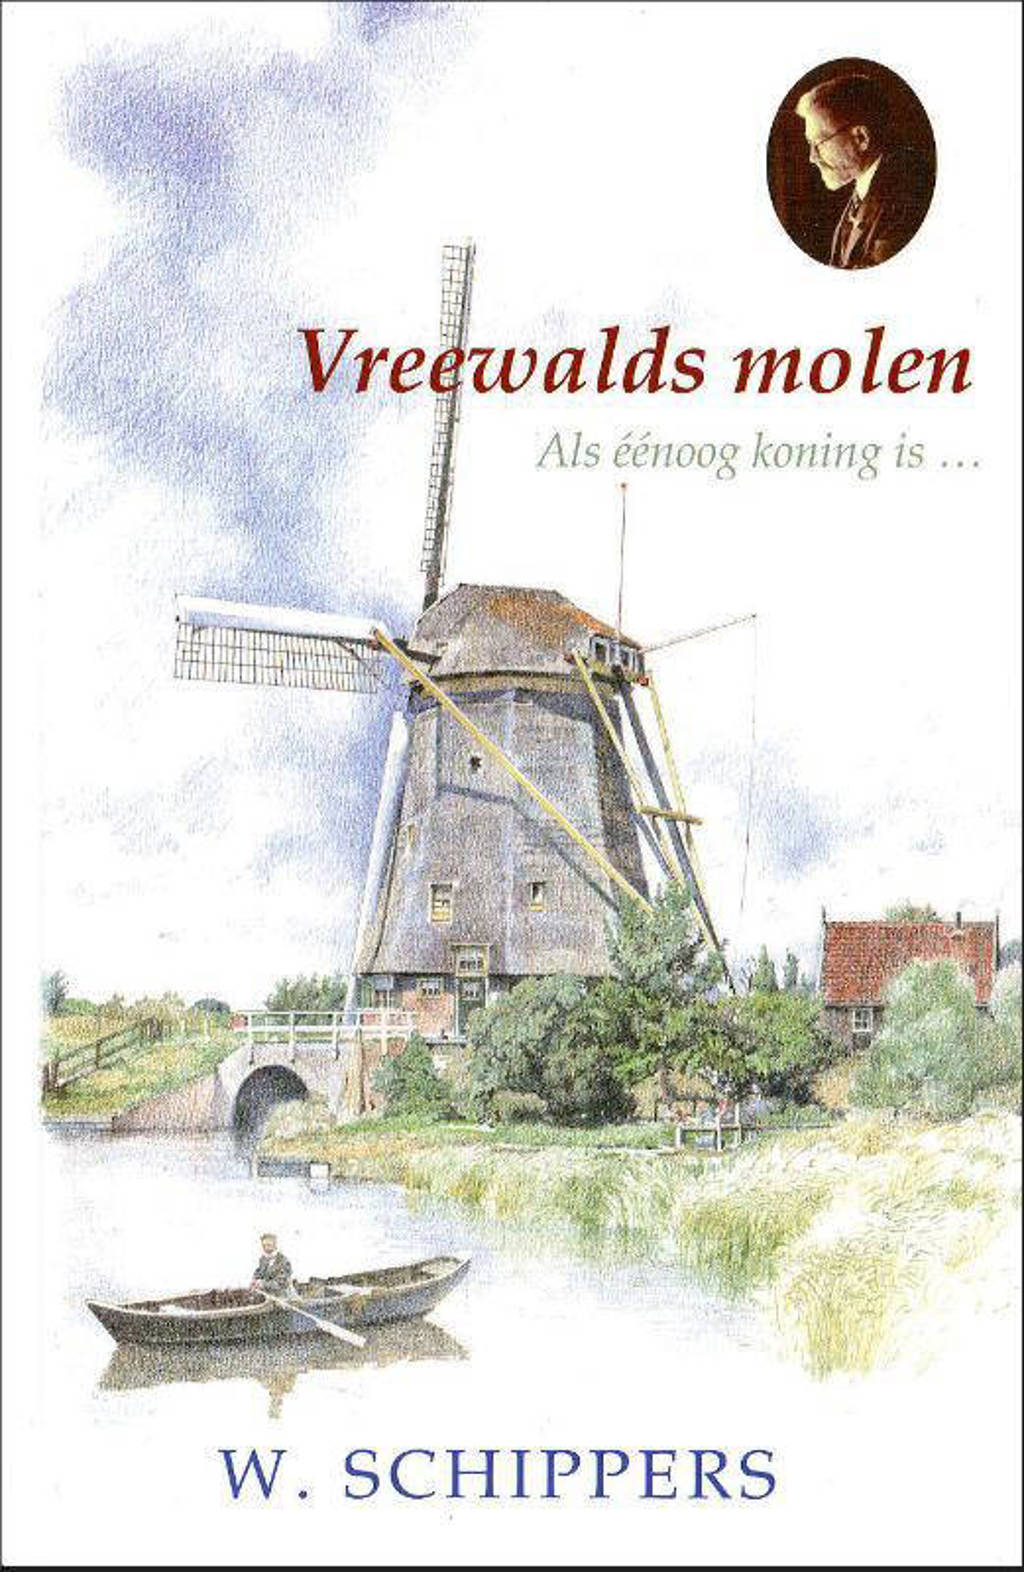 Vreewalds molen - Willem Schippers